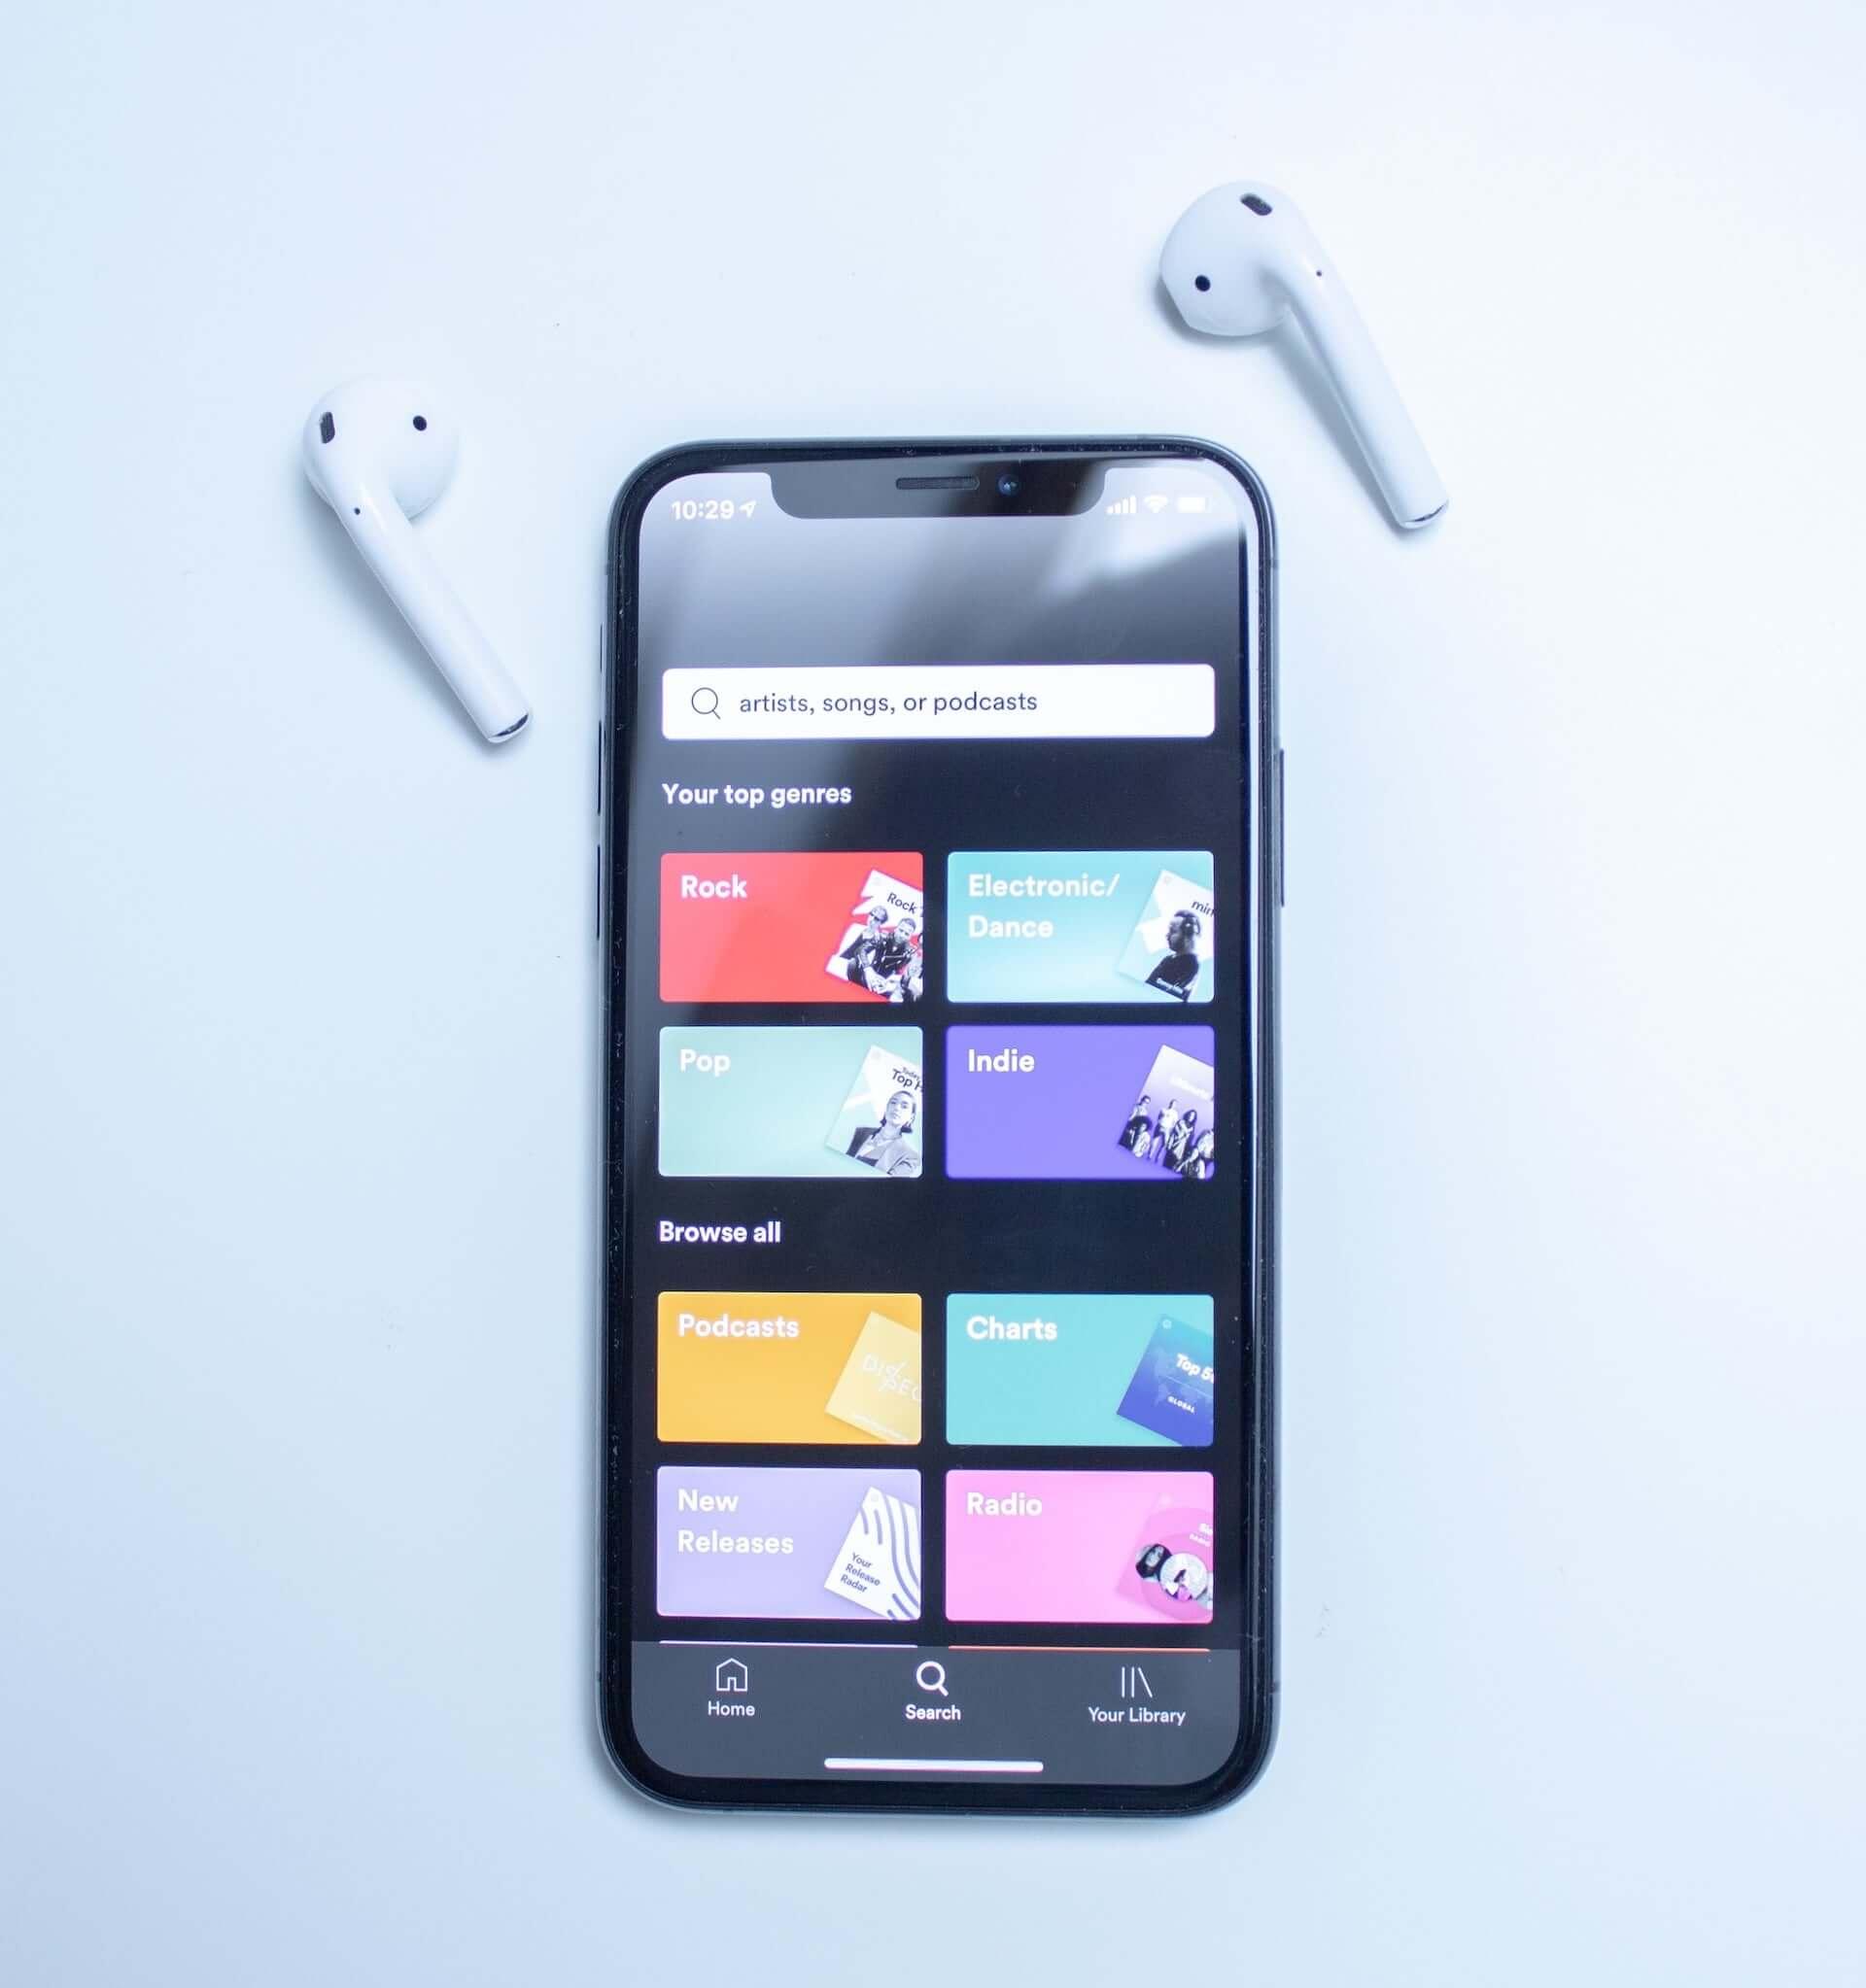 Spotifyで聴ける音楽を親が管理!?ファミリープランにペアレントコントロールが追加か tech190819_spotify_family_main-1920x2046